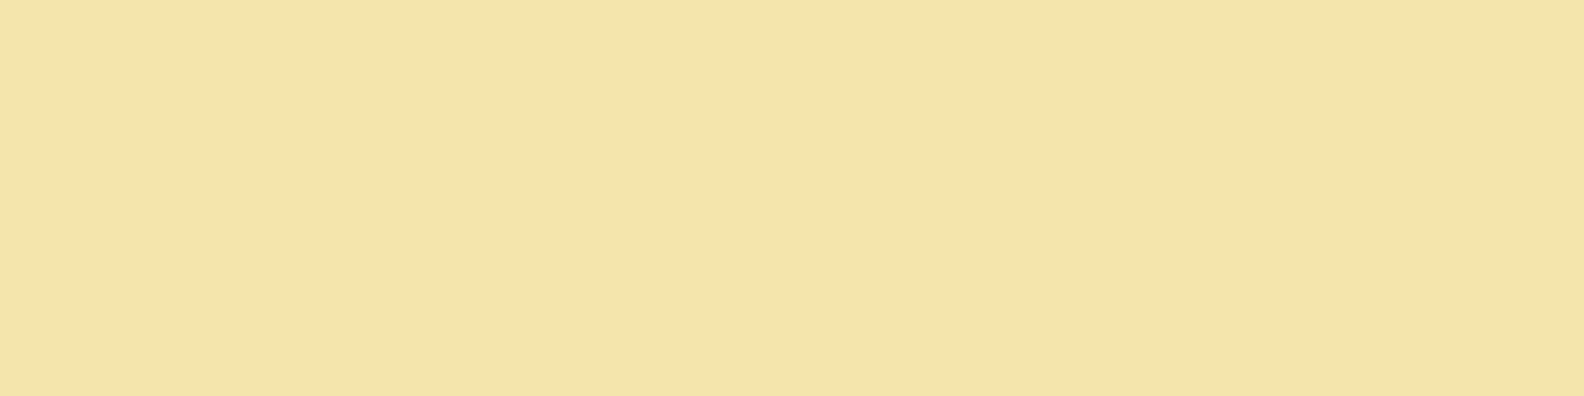 1584x396 Vanilla Solid Color Background